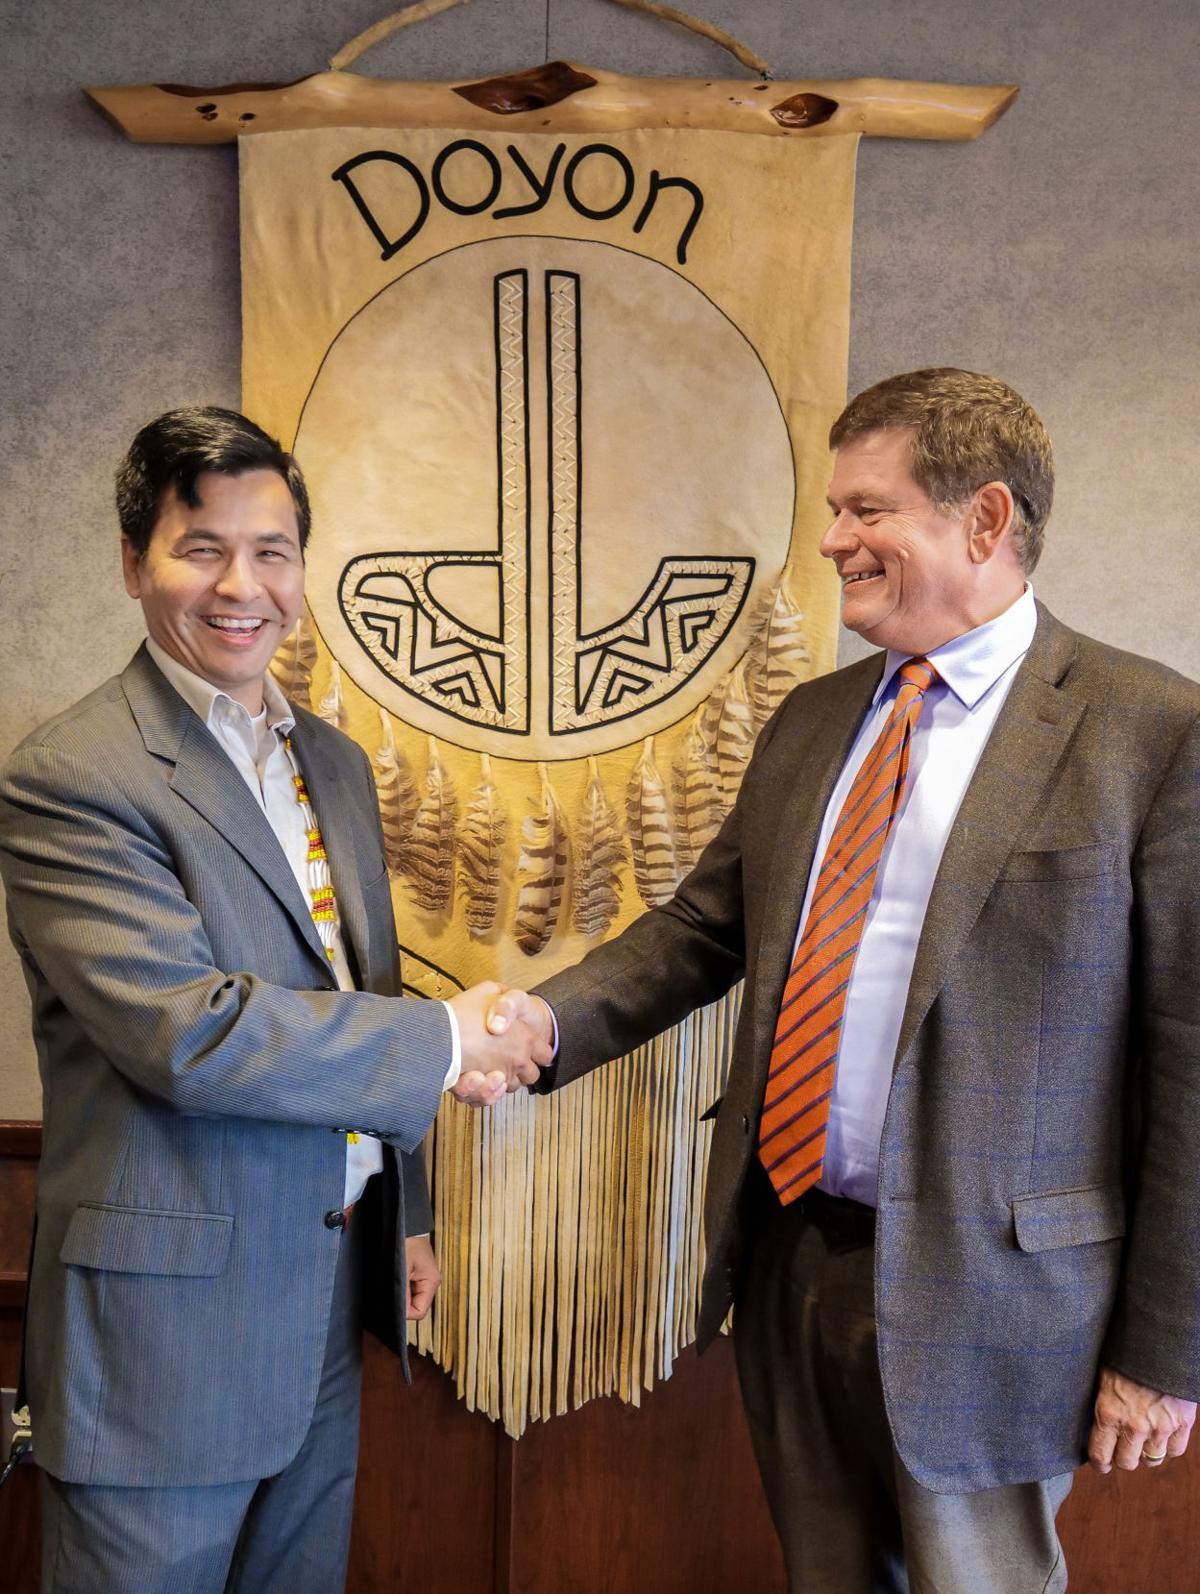 Doyon and Hilcorp agreement